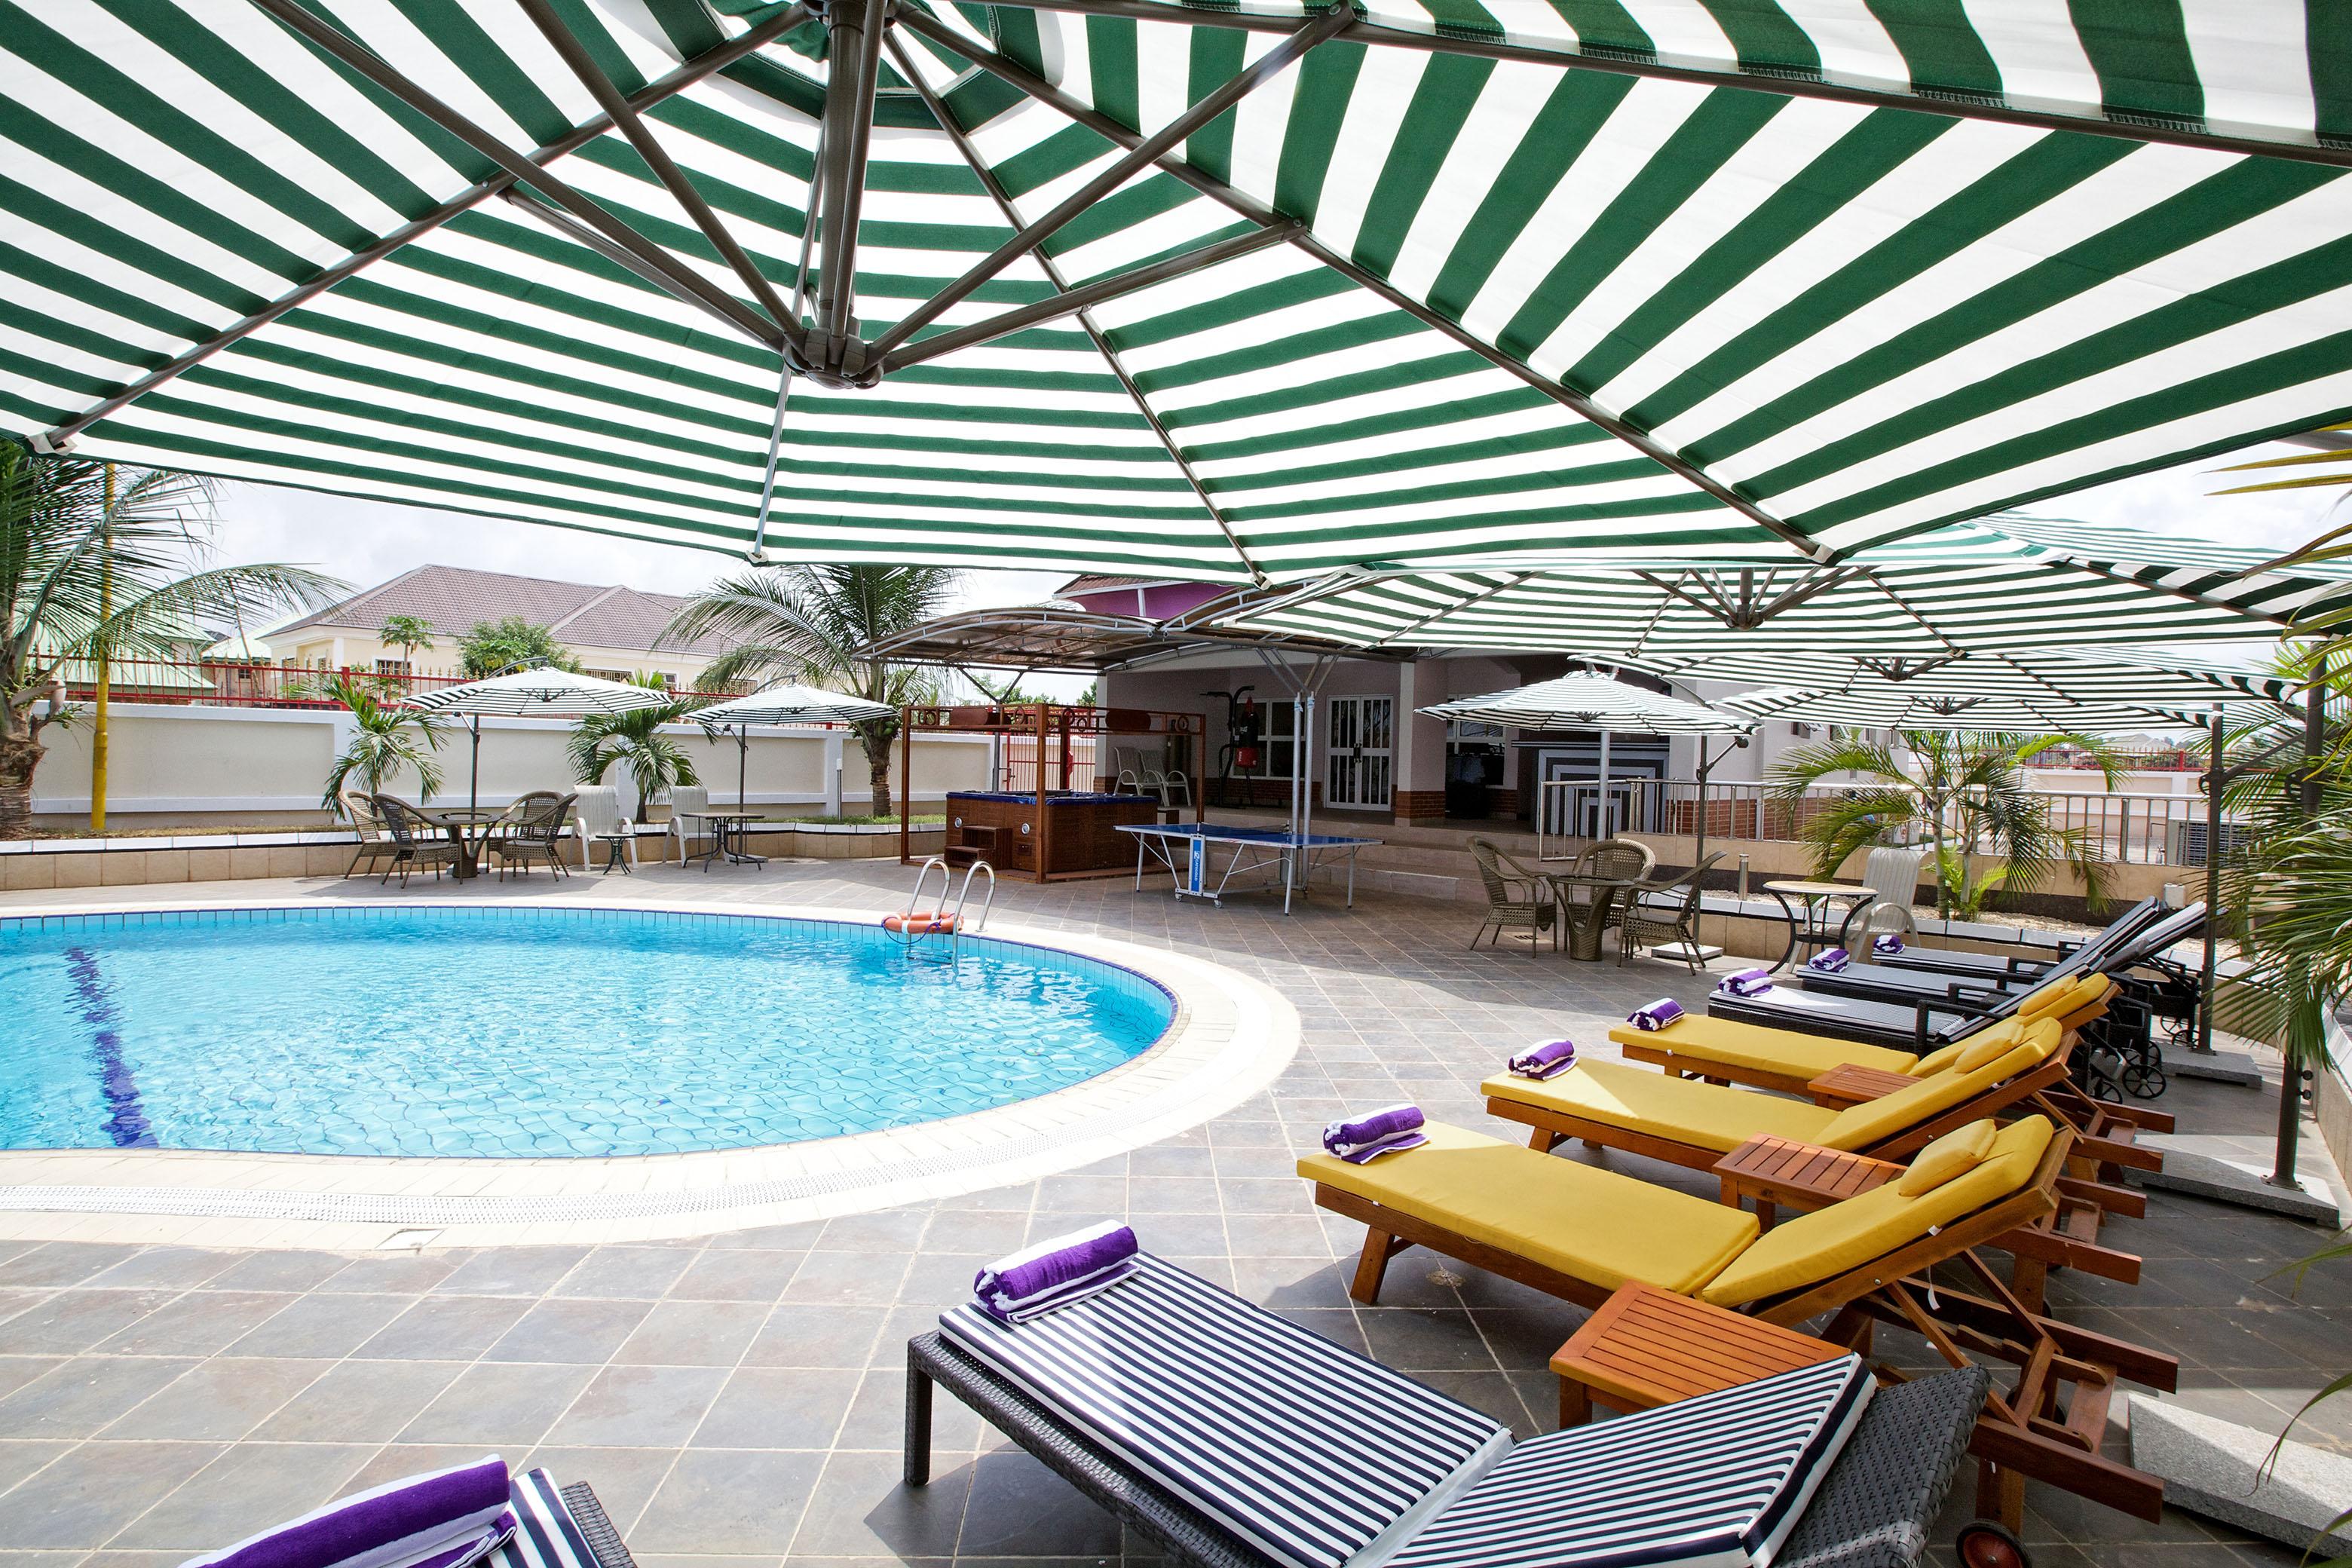 Oxygen Hotel Poolside, Owerri